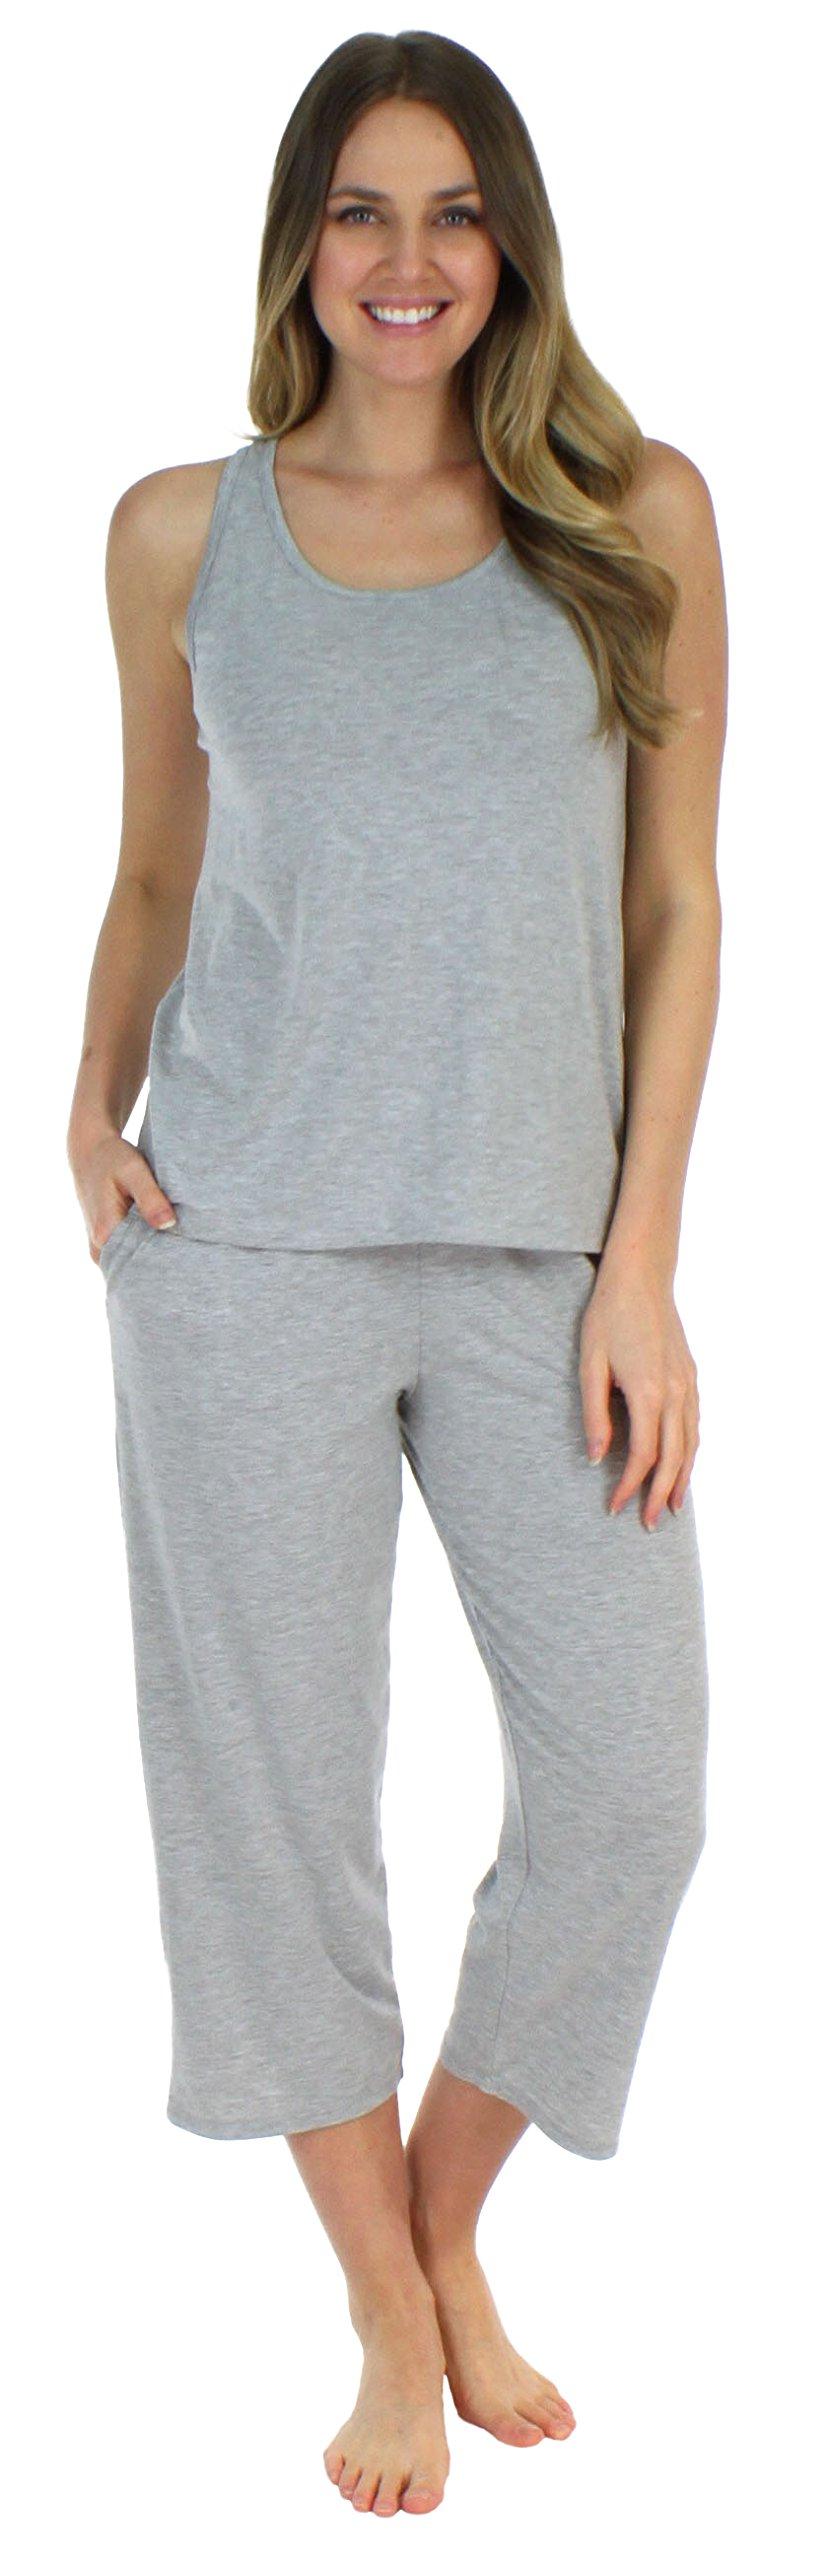 Sleepyheads Women's Sleepwear Jersey Lightweight Tank Top and Capri Pajama Set (SH1832-2027-XL)